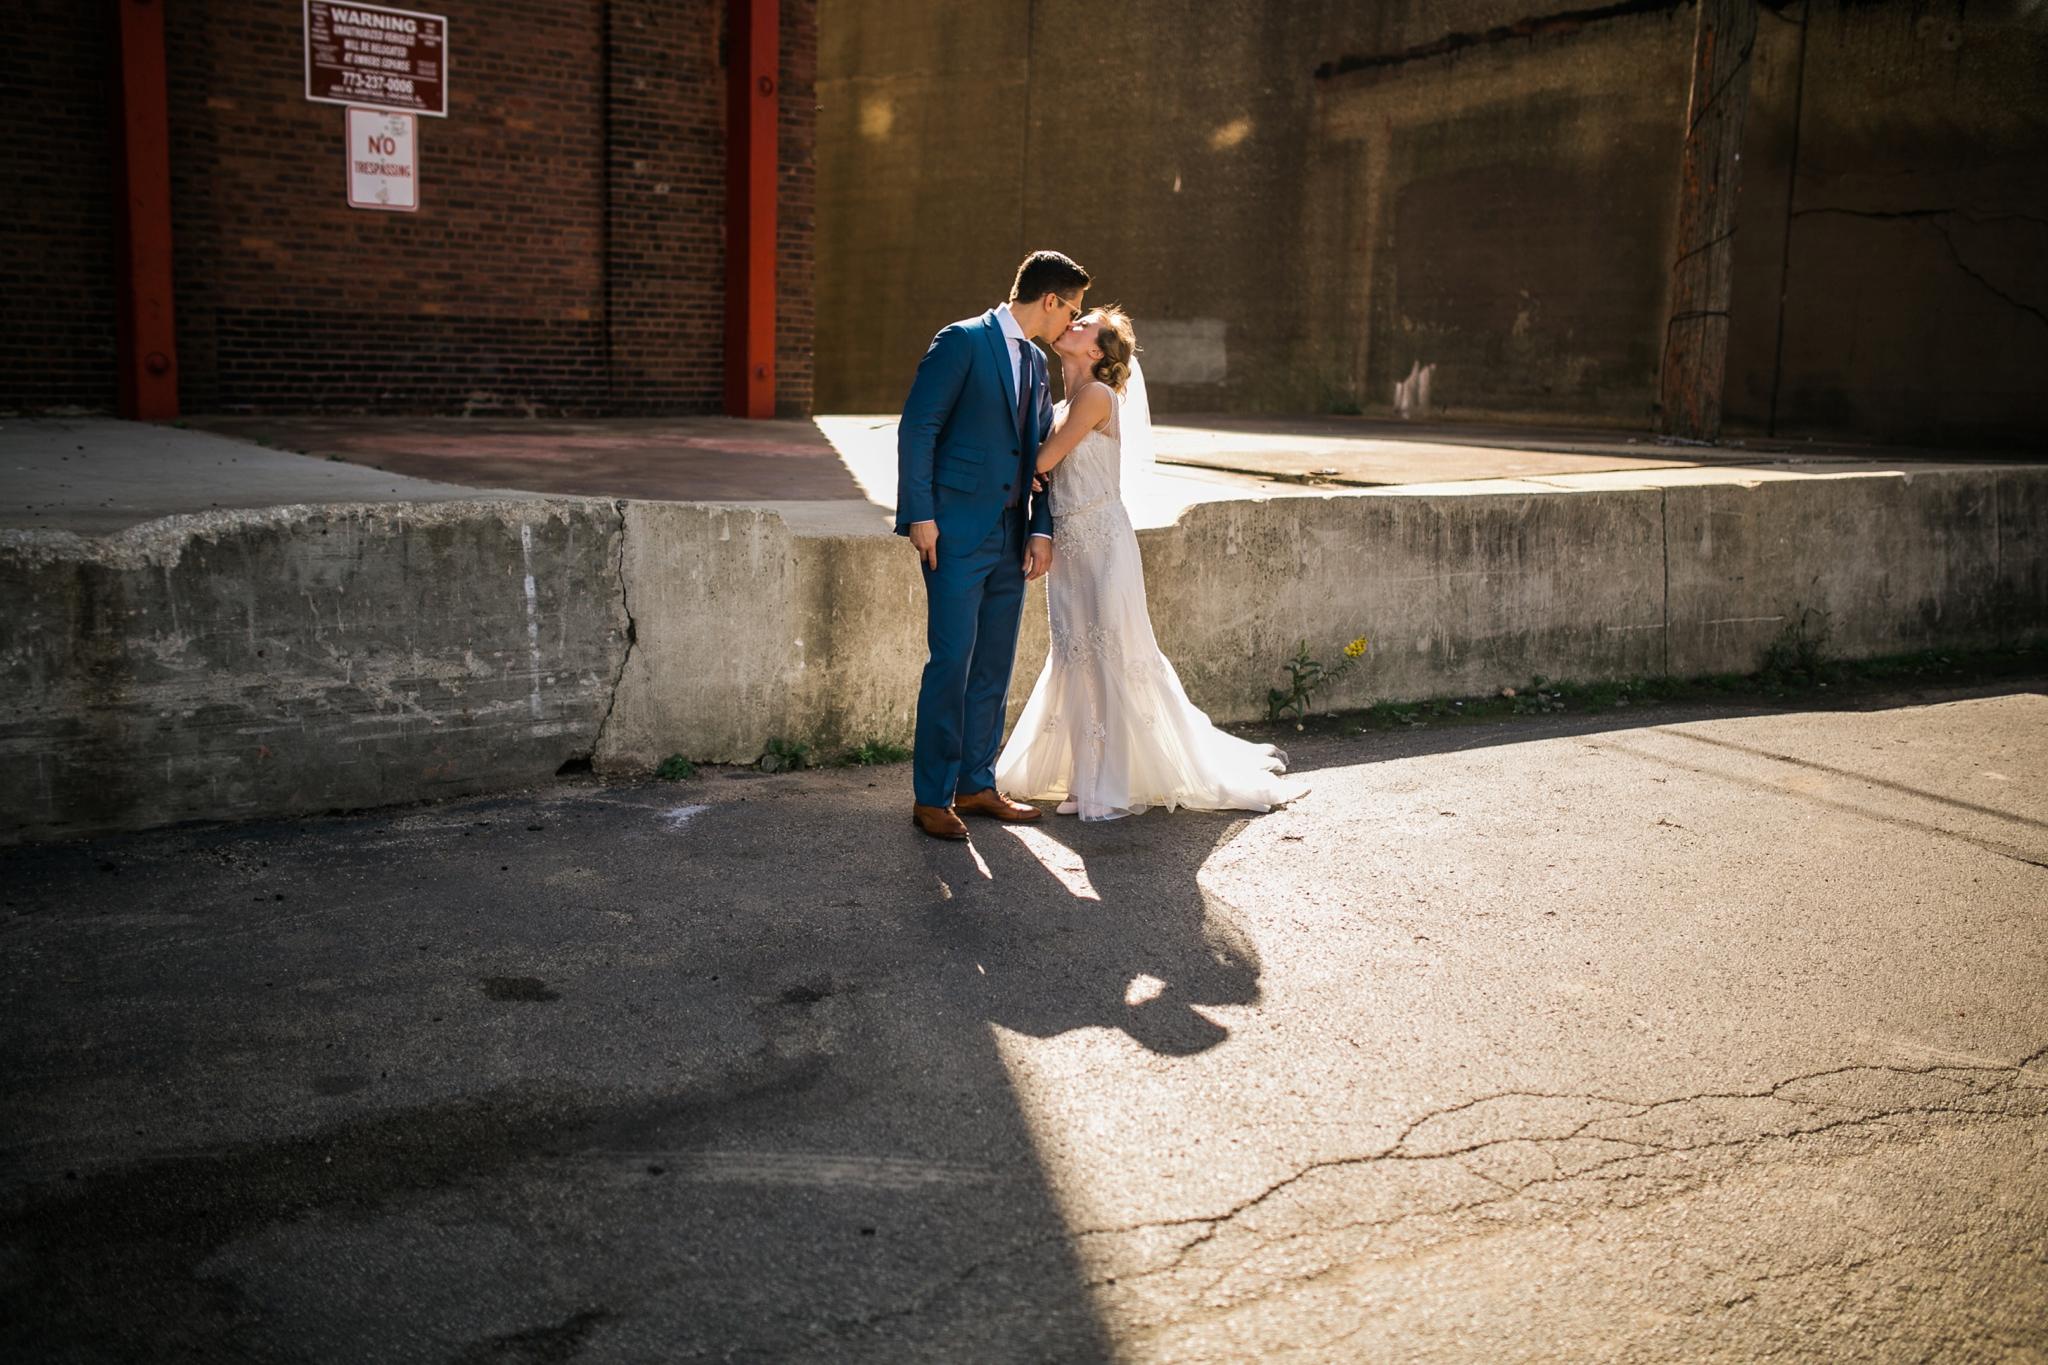 West-Supply-Foundry-Chicago-Wedding-074.jpg